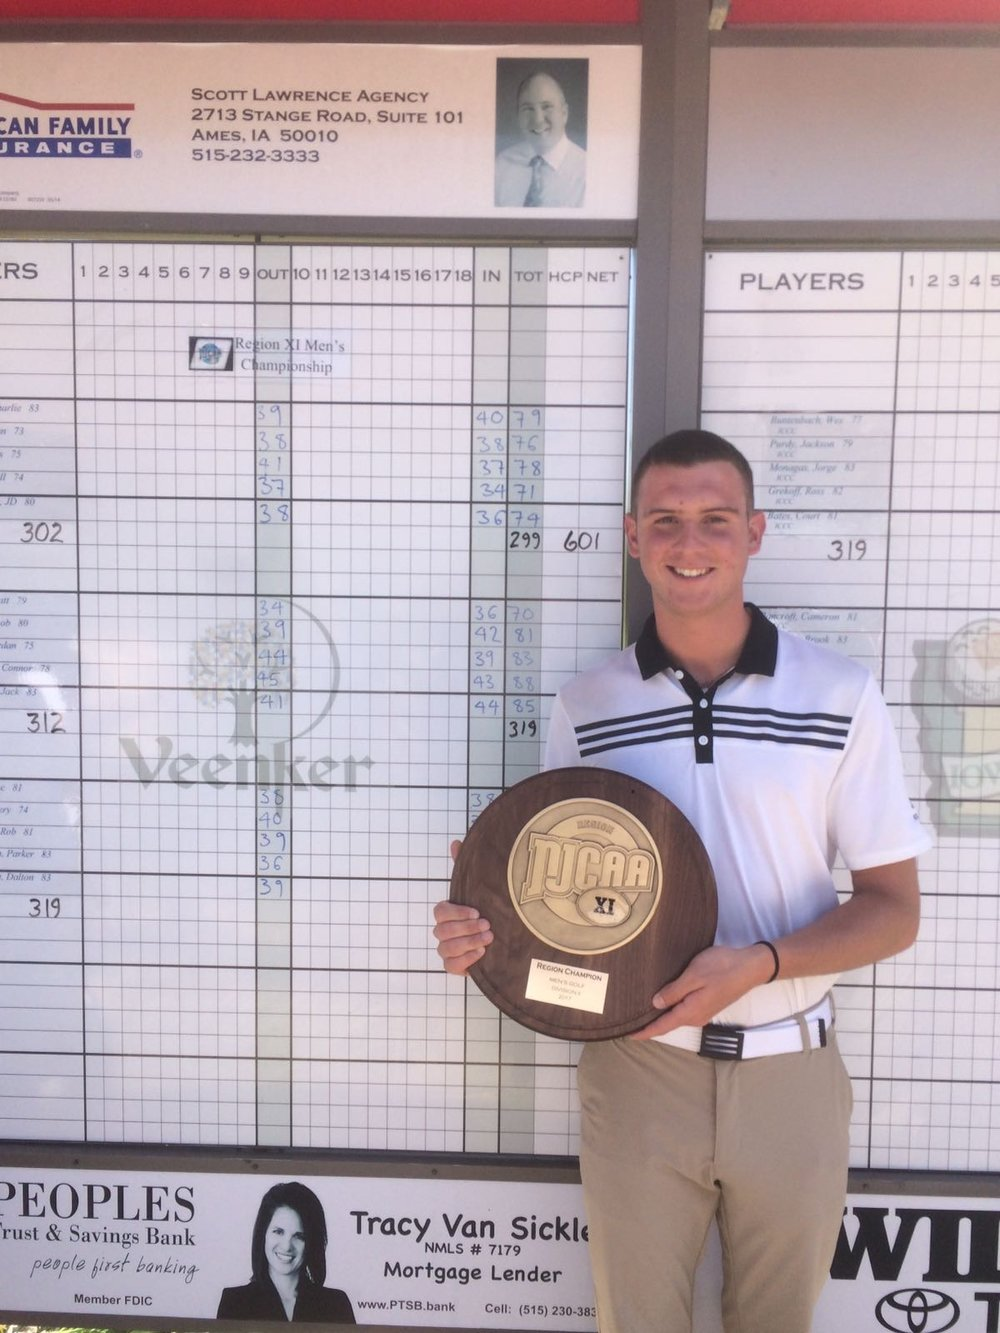 Regional Champion 2017